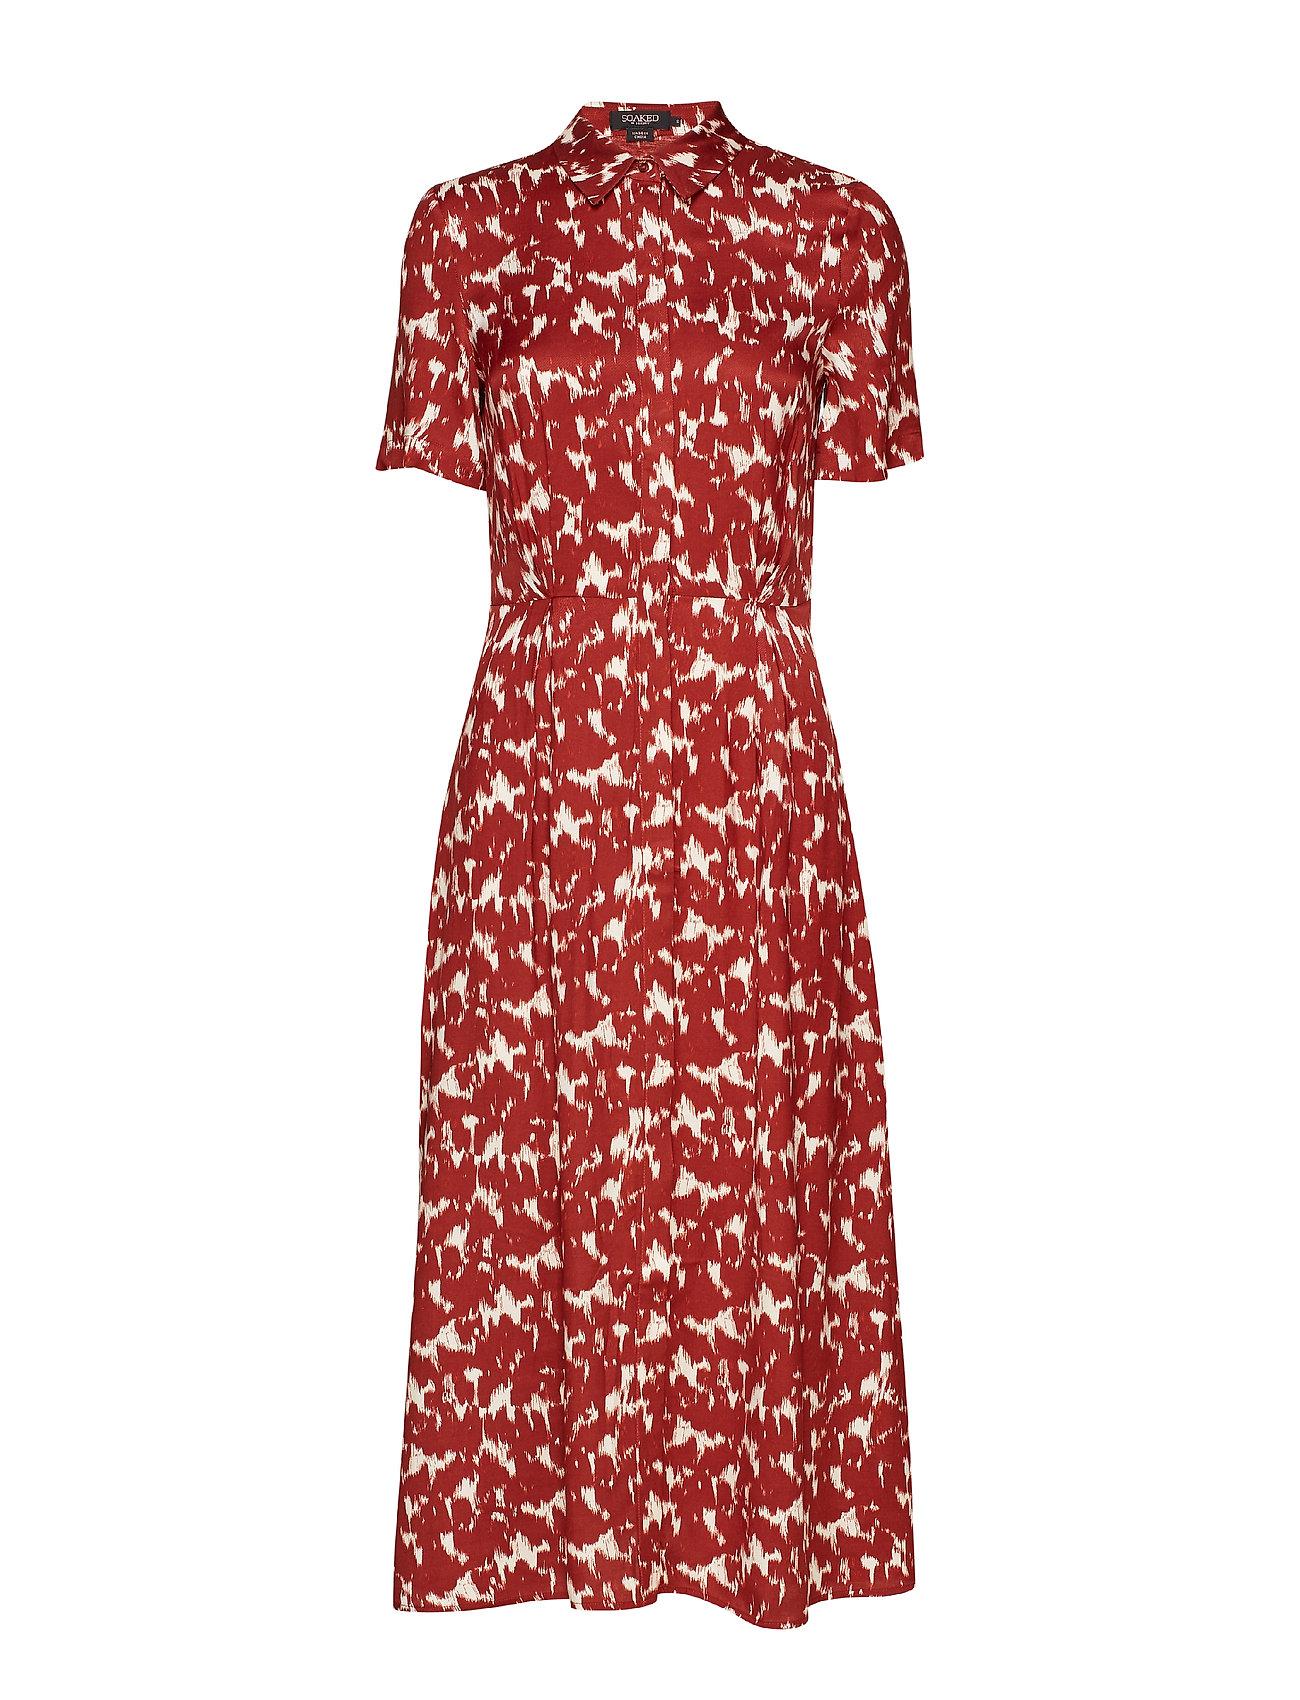 Soaked in Luxury SLZaldana Shirt Dress Print - FIRED BRICK PRINT